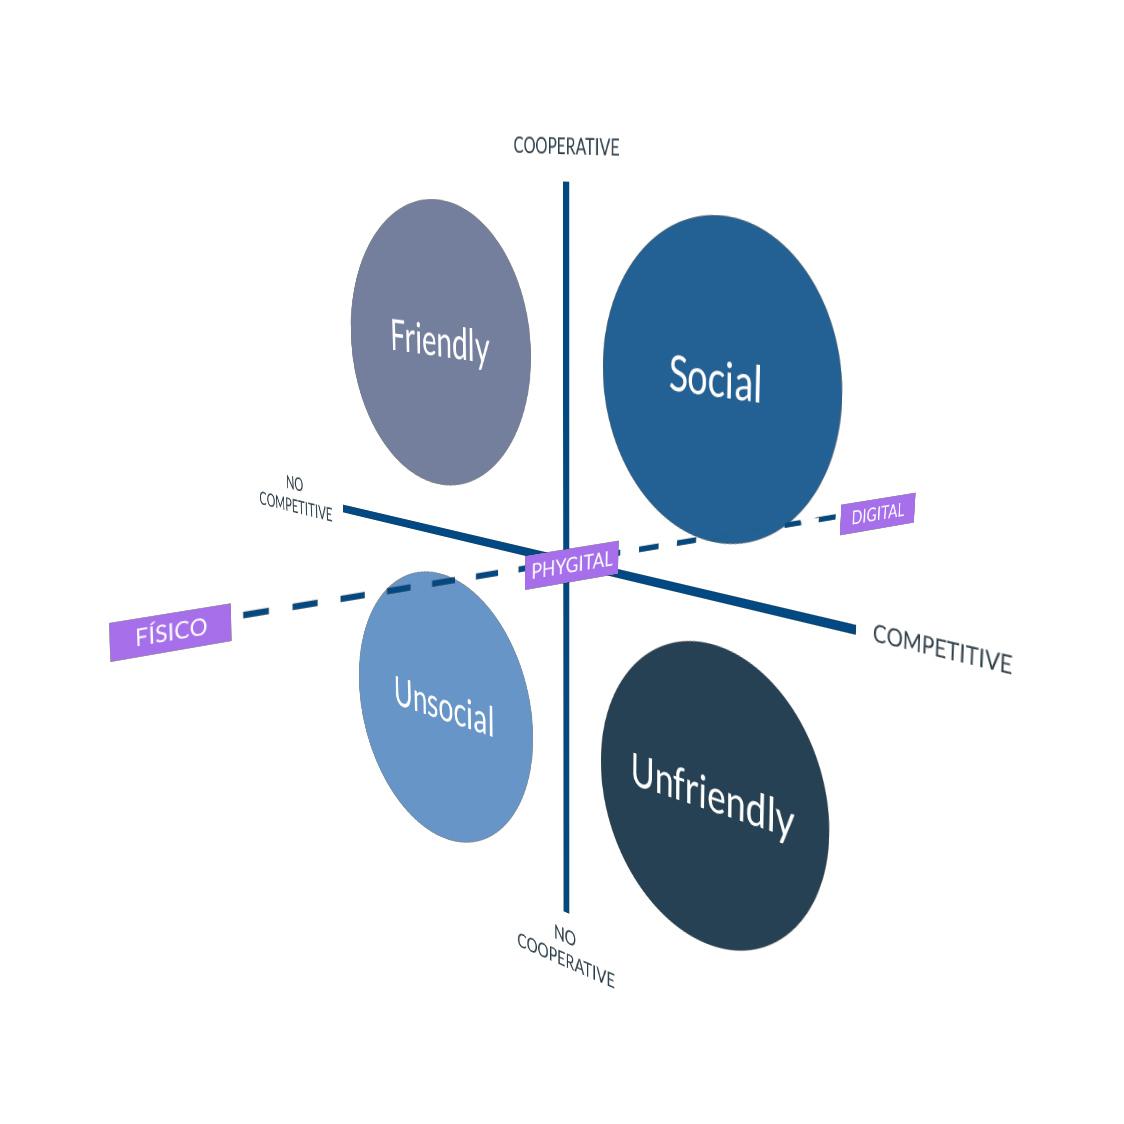 grafico phygital social games